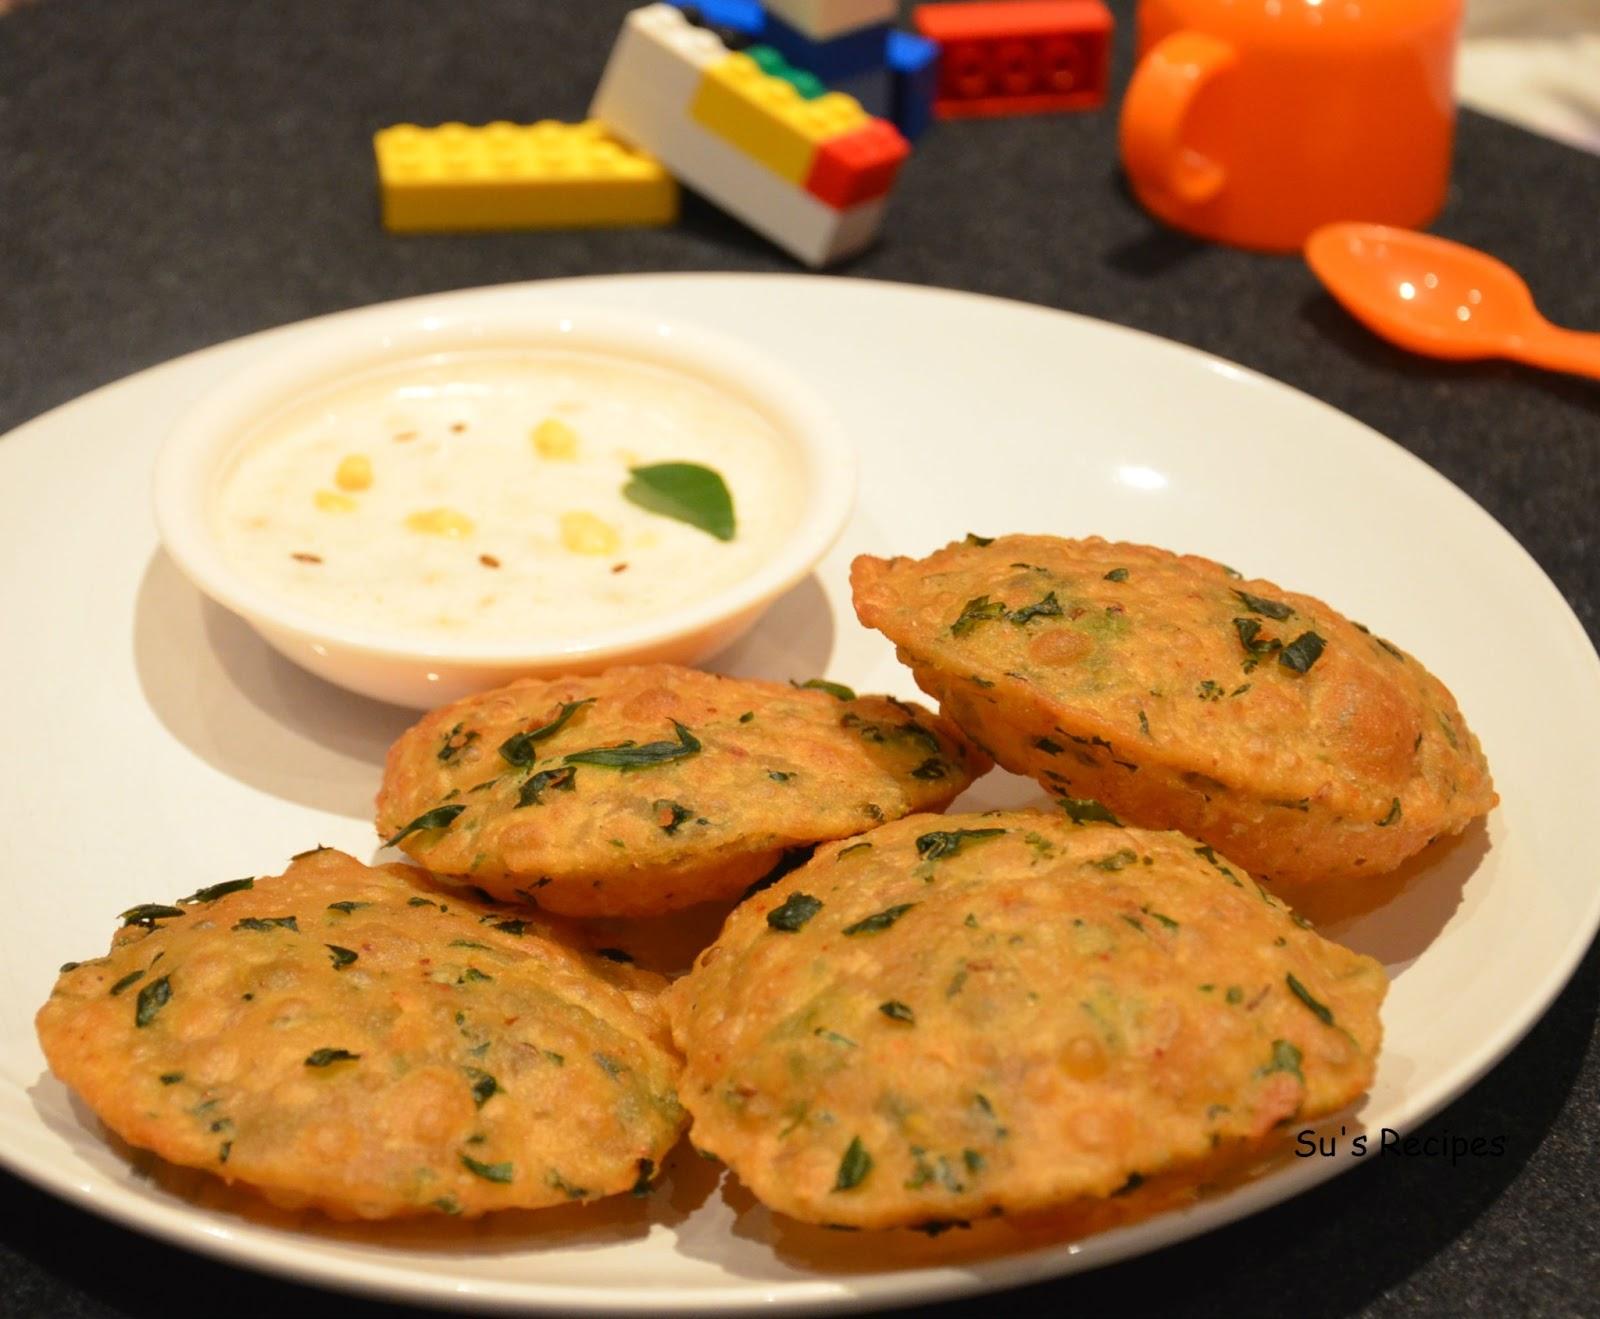 methi poori, poori, menthu koora poori, tiffen dish, Indian breakfast, kids dish, kids recipes, menthya poori, spiced poori